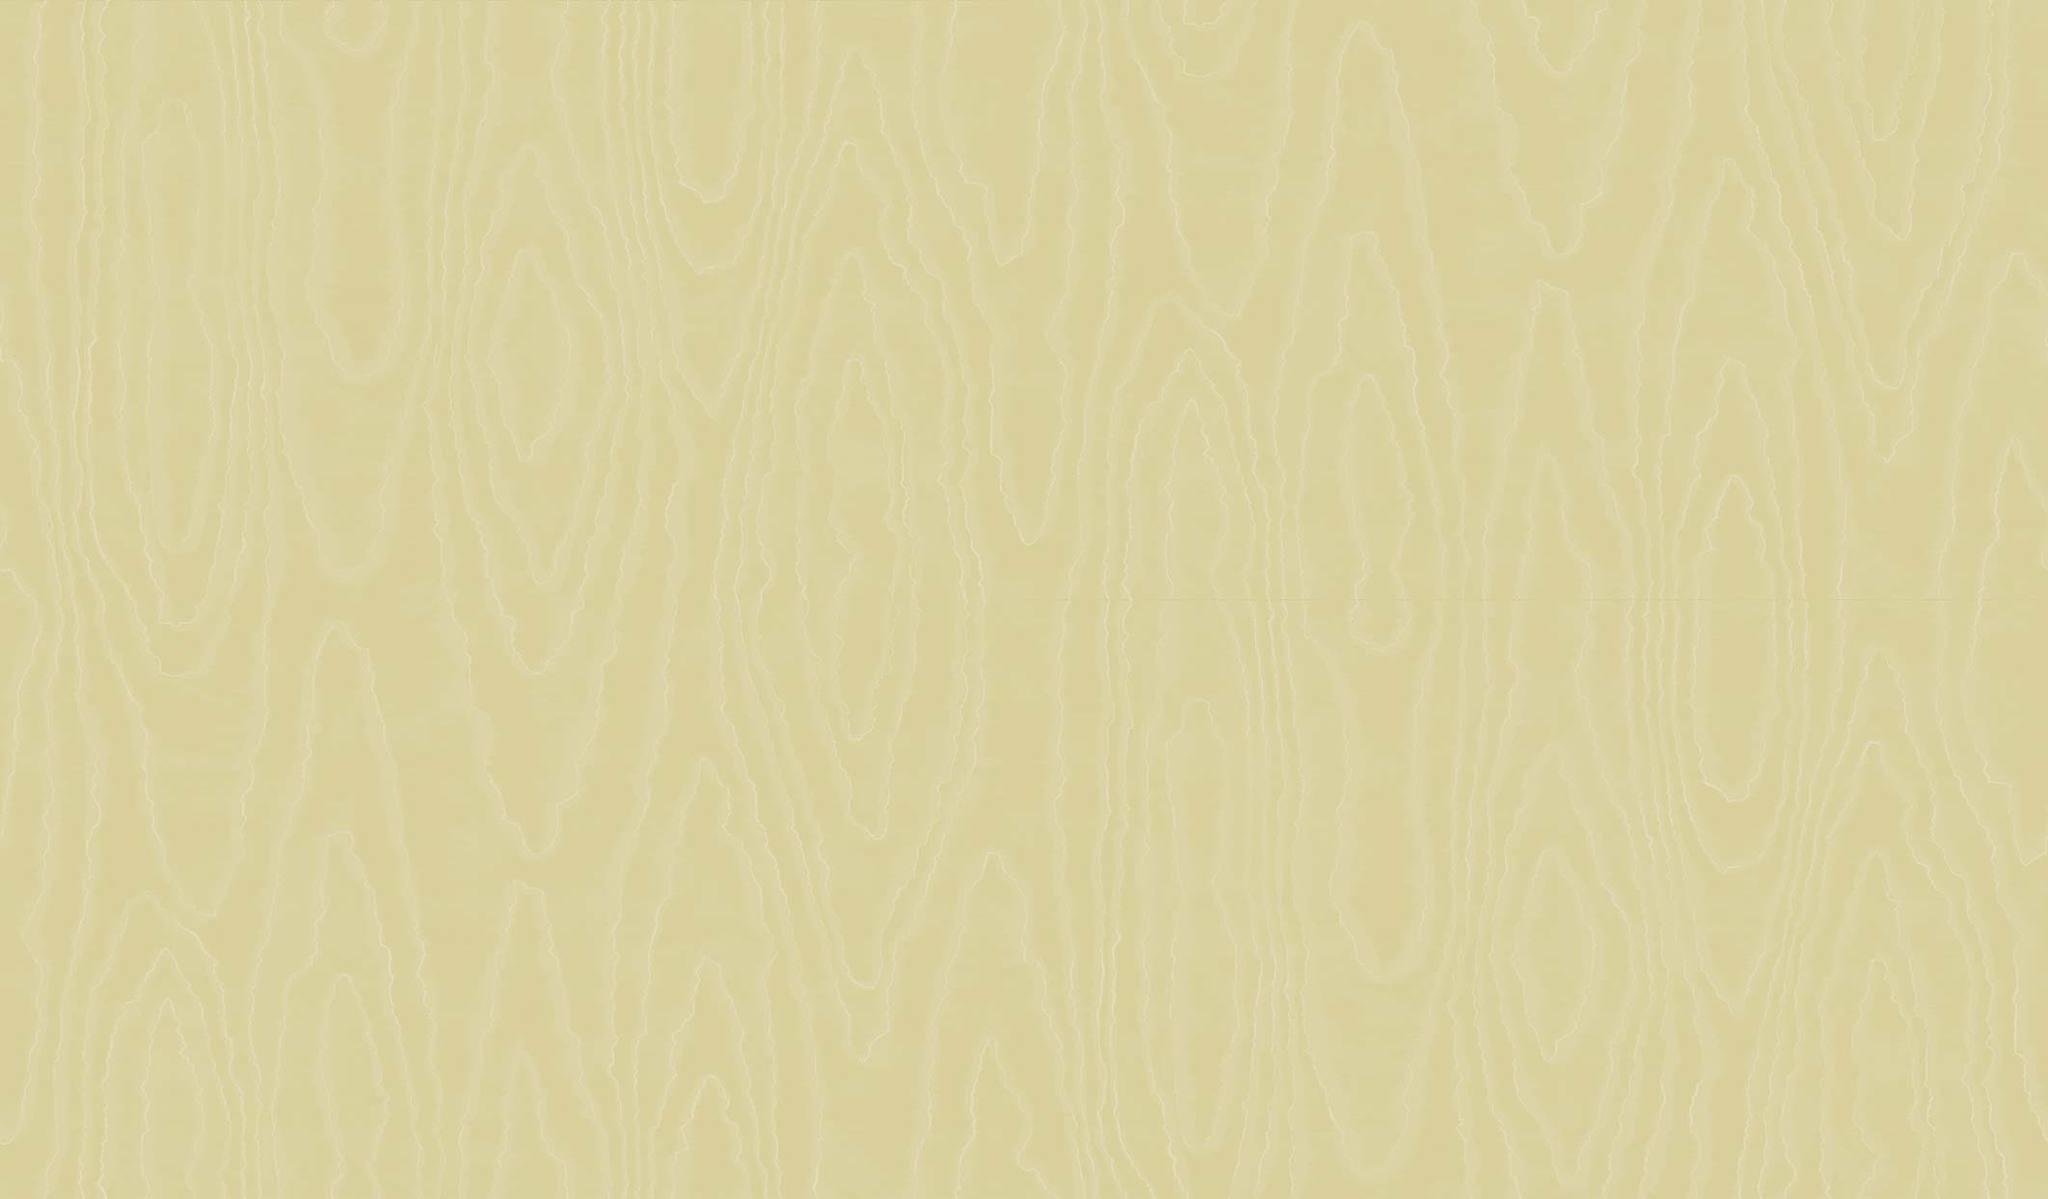 Обои Cole & Son Landscape Plains 106/1011, интернет магазин Волео